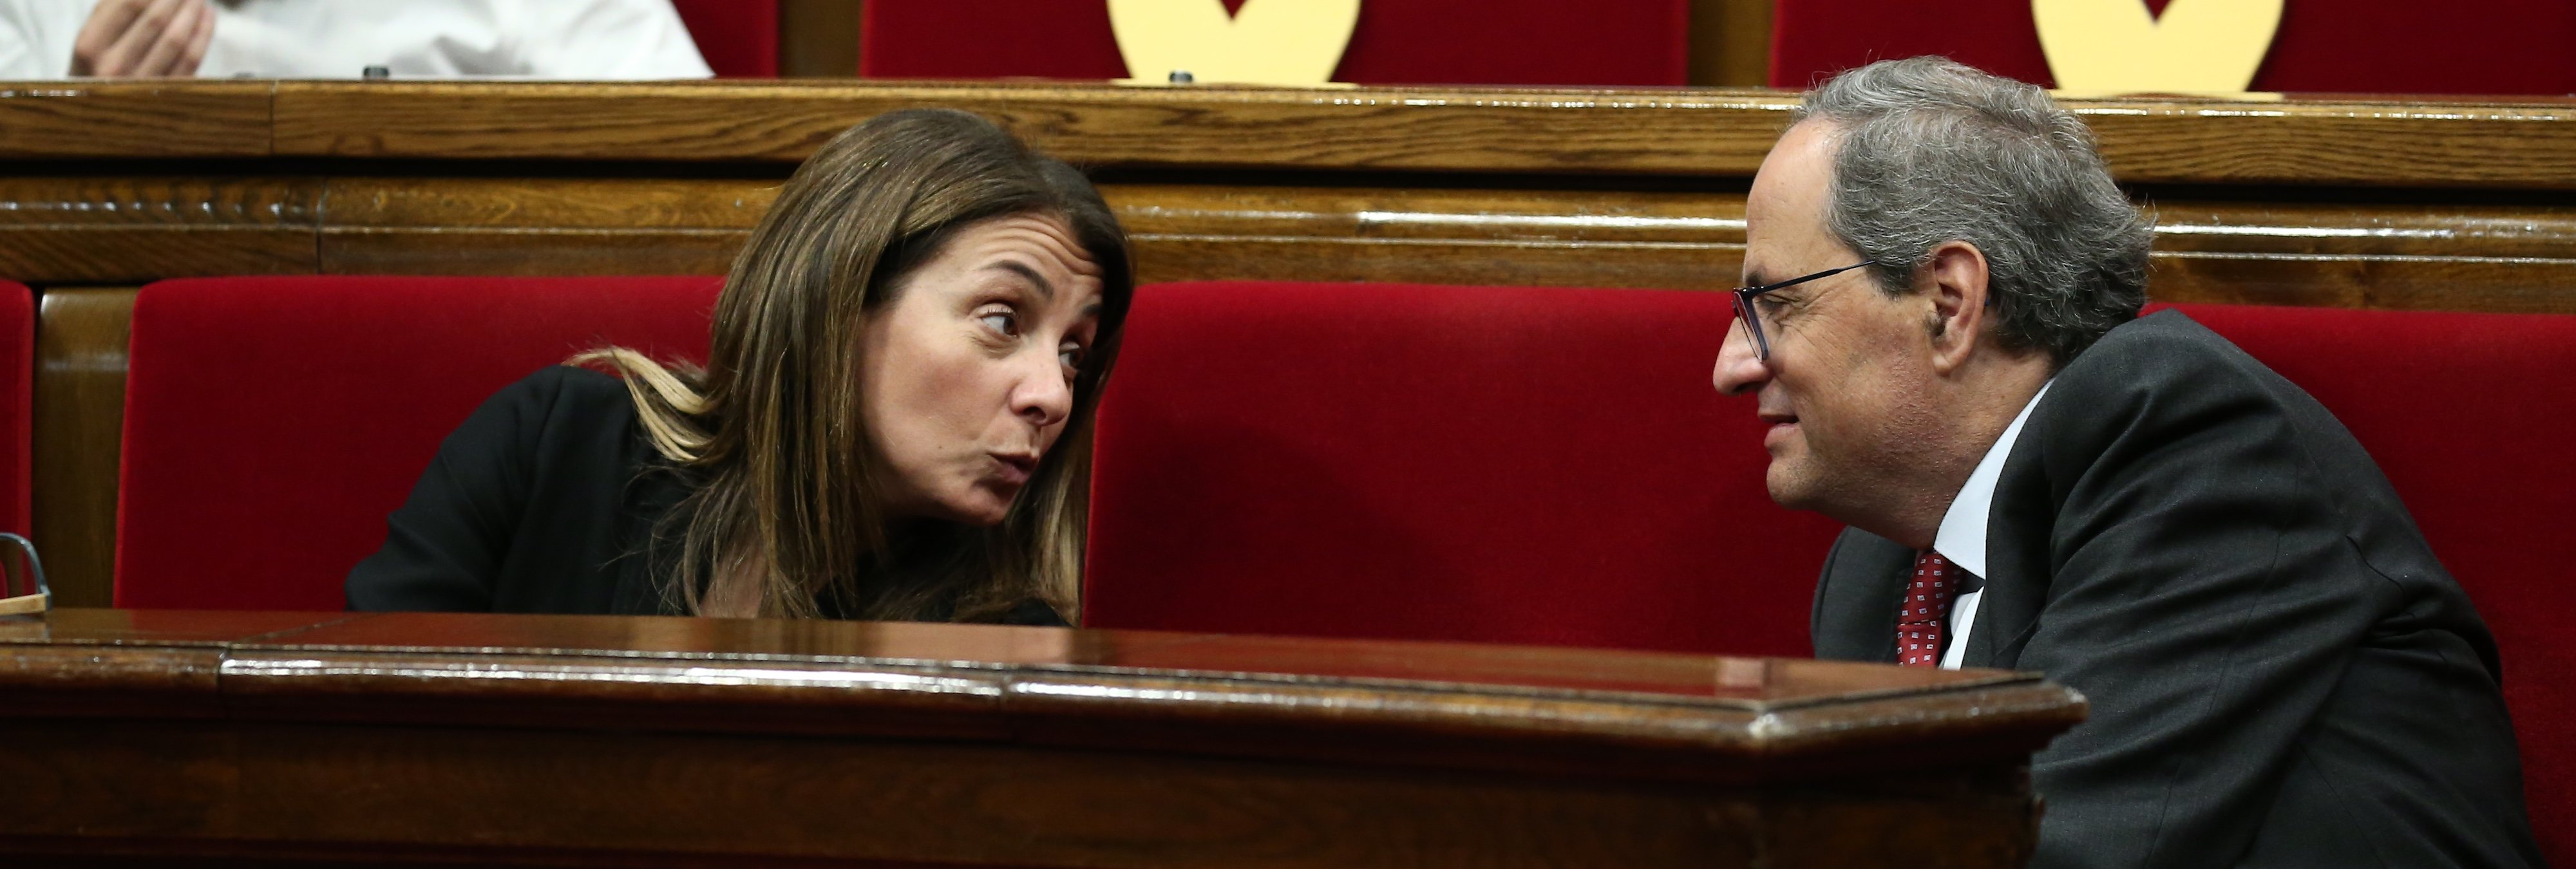 La portavoz de la Generalitat, Meritxell Budó, se niega a responder preguntas en castellano